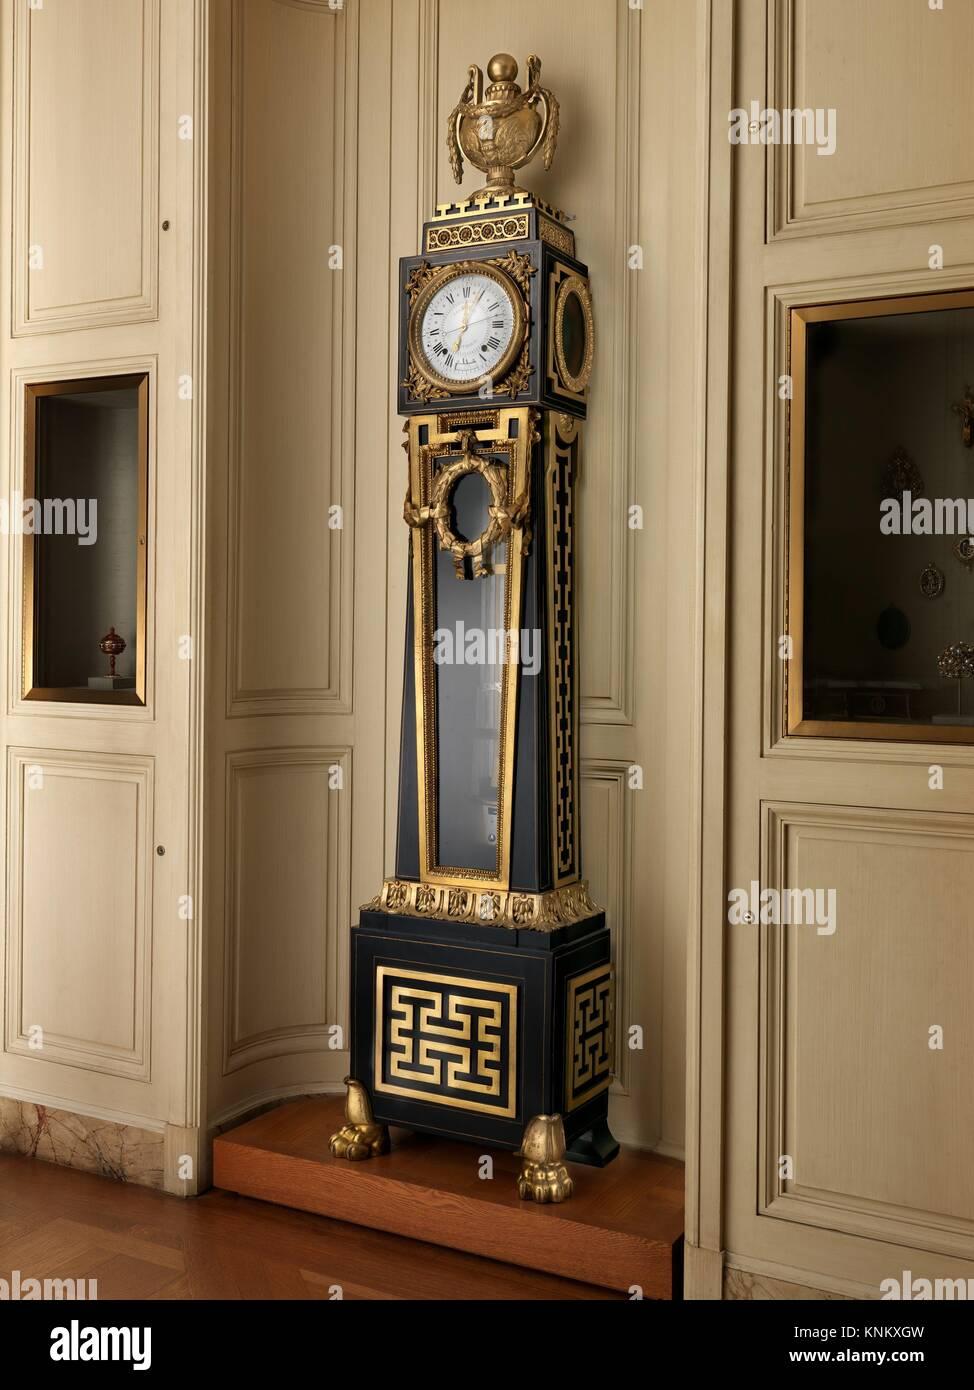 Longcase astronomical regulator. Maker: Clockmaker: Ferdinand Berthoud (French, 1727-1807); Maker: Case maker: Balthazar - Stock Image